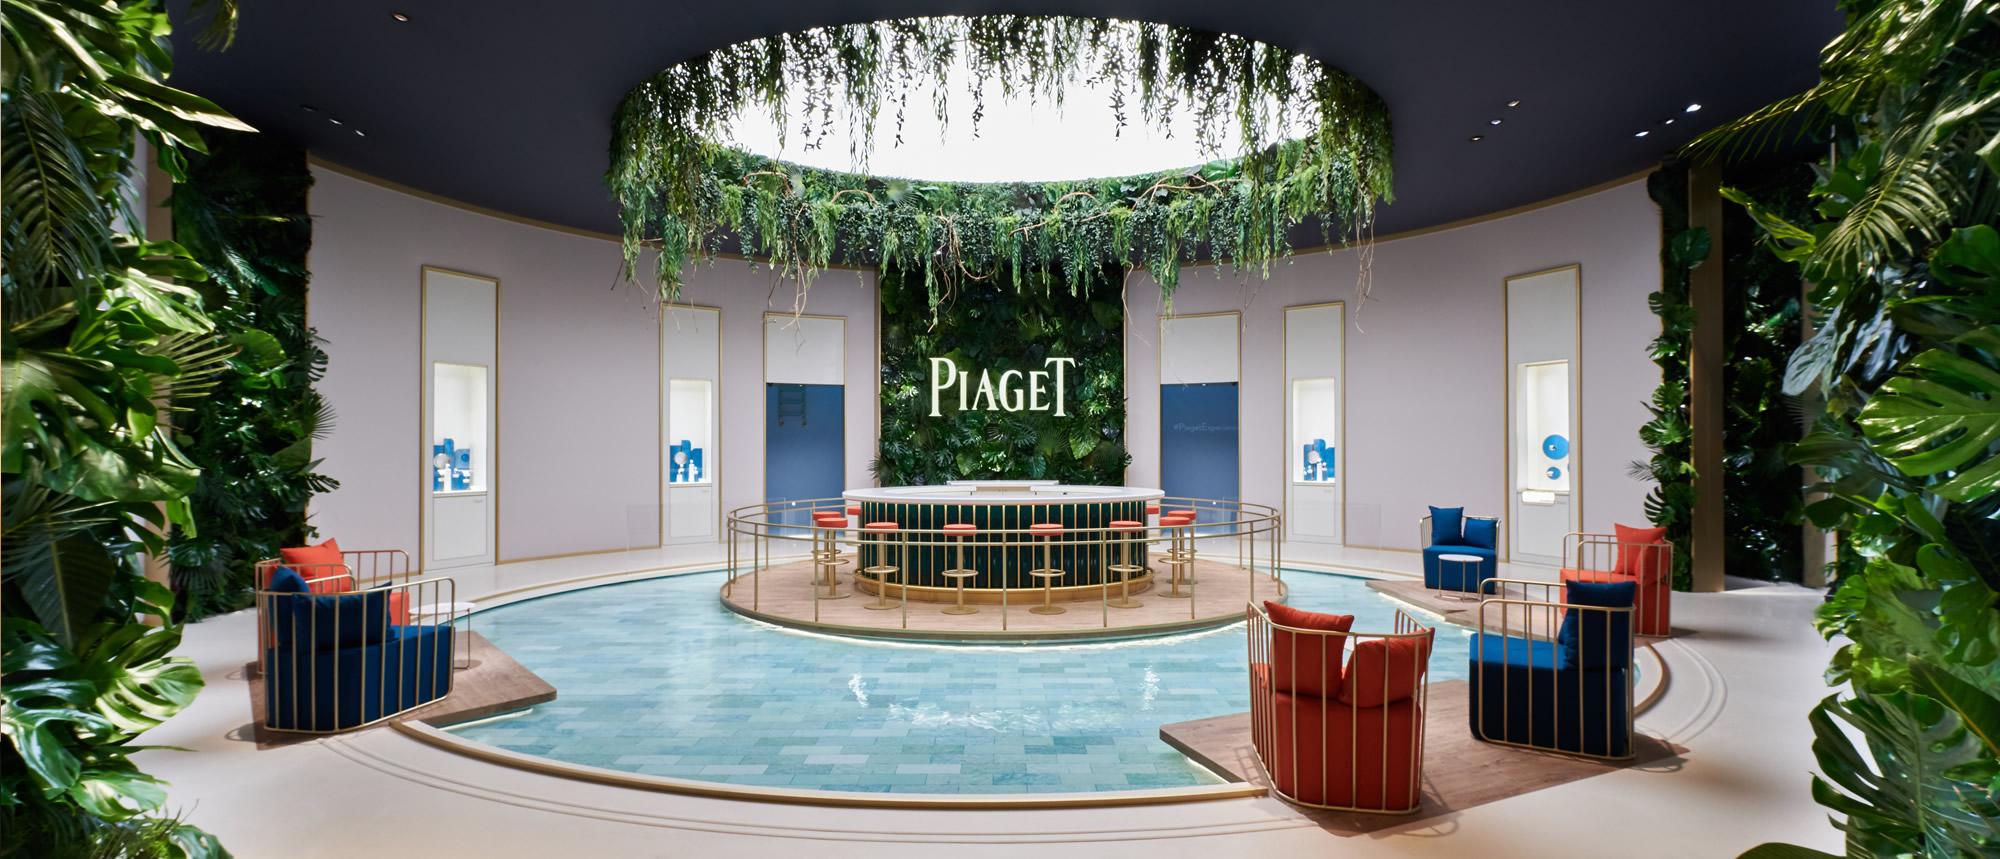 stand-salon-piaget-2018